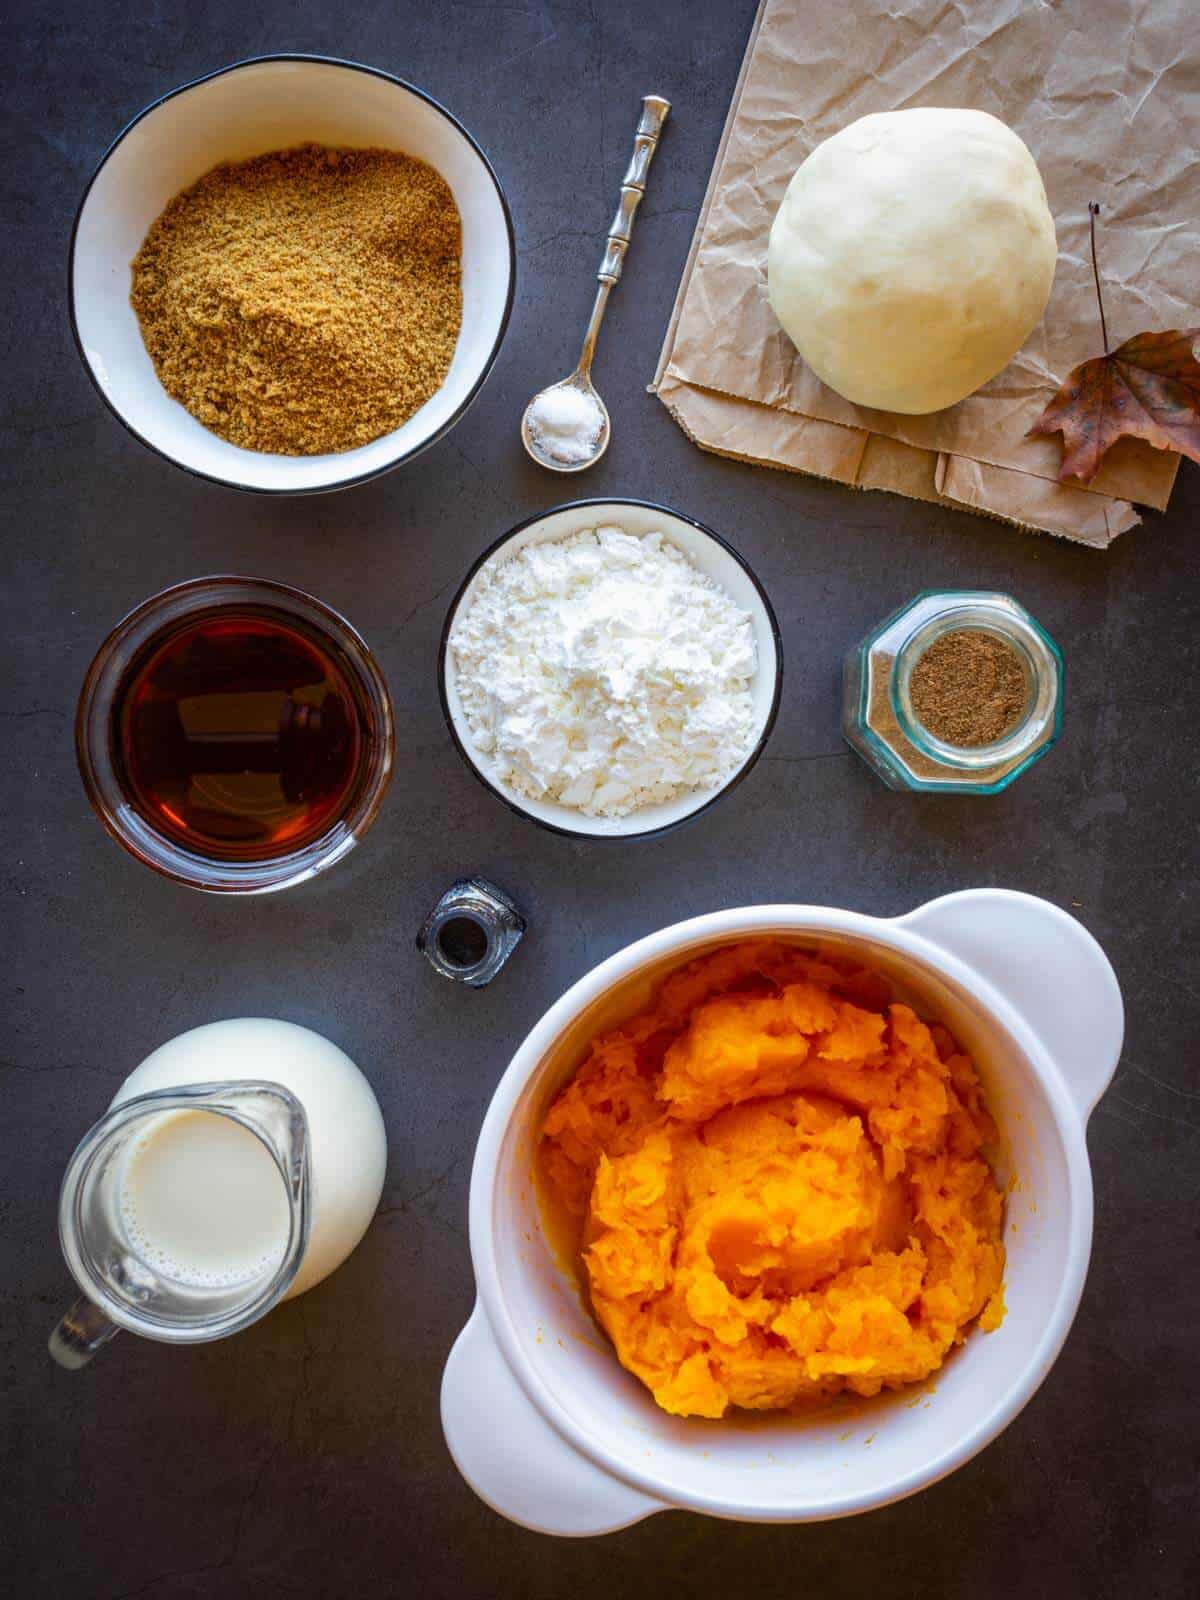 pumpkin pie recipe ingredients